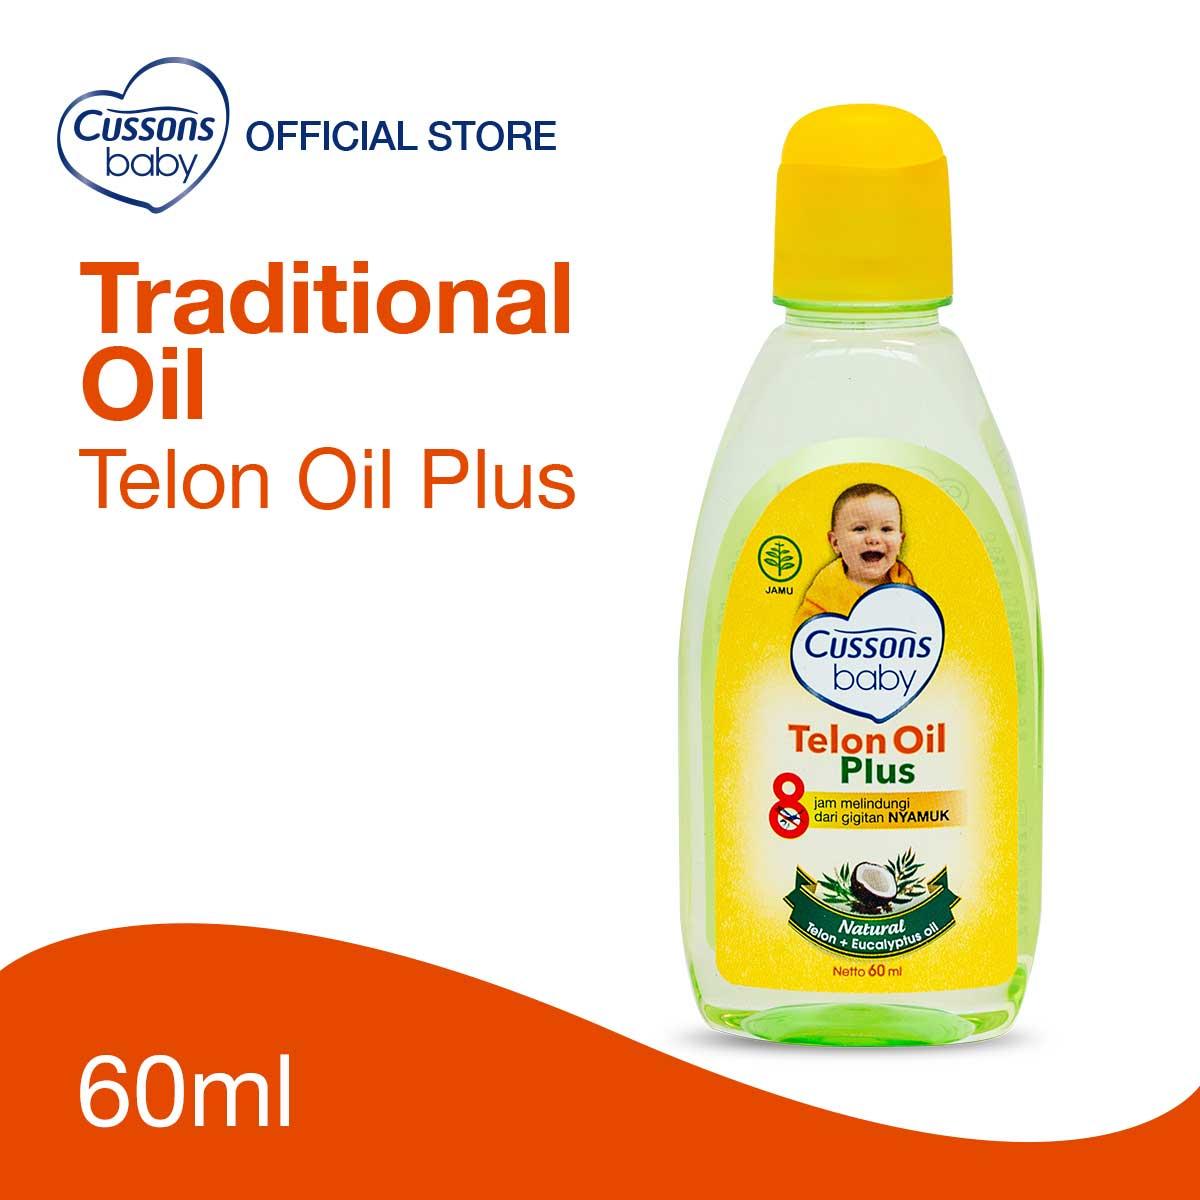 Cussons Baby Telon Oil Plus 60ml